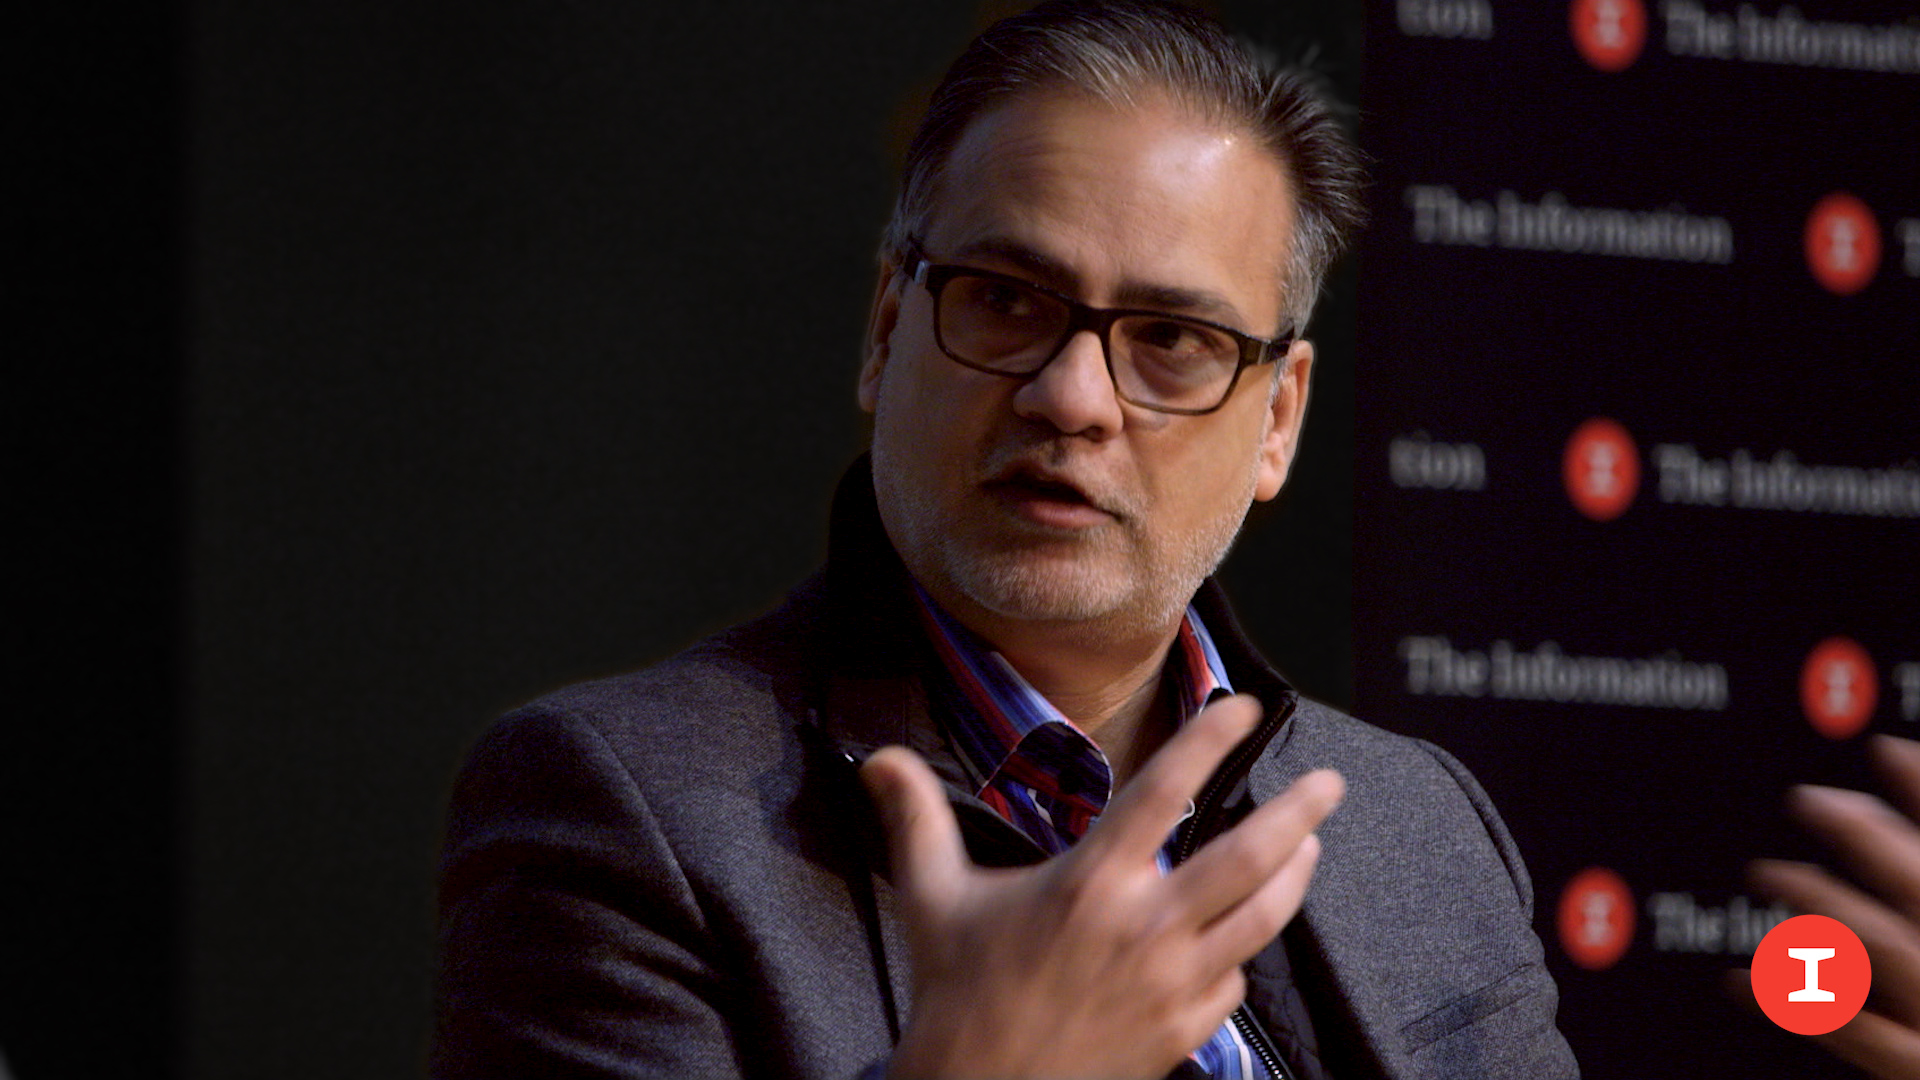 IBM Cloud Exec Says AI, Blockchain Are Cash Cows Of Future